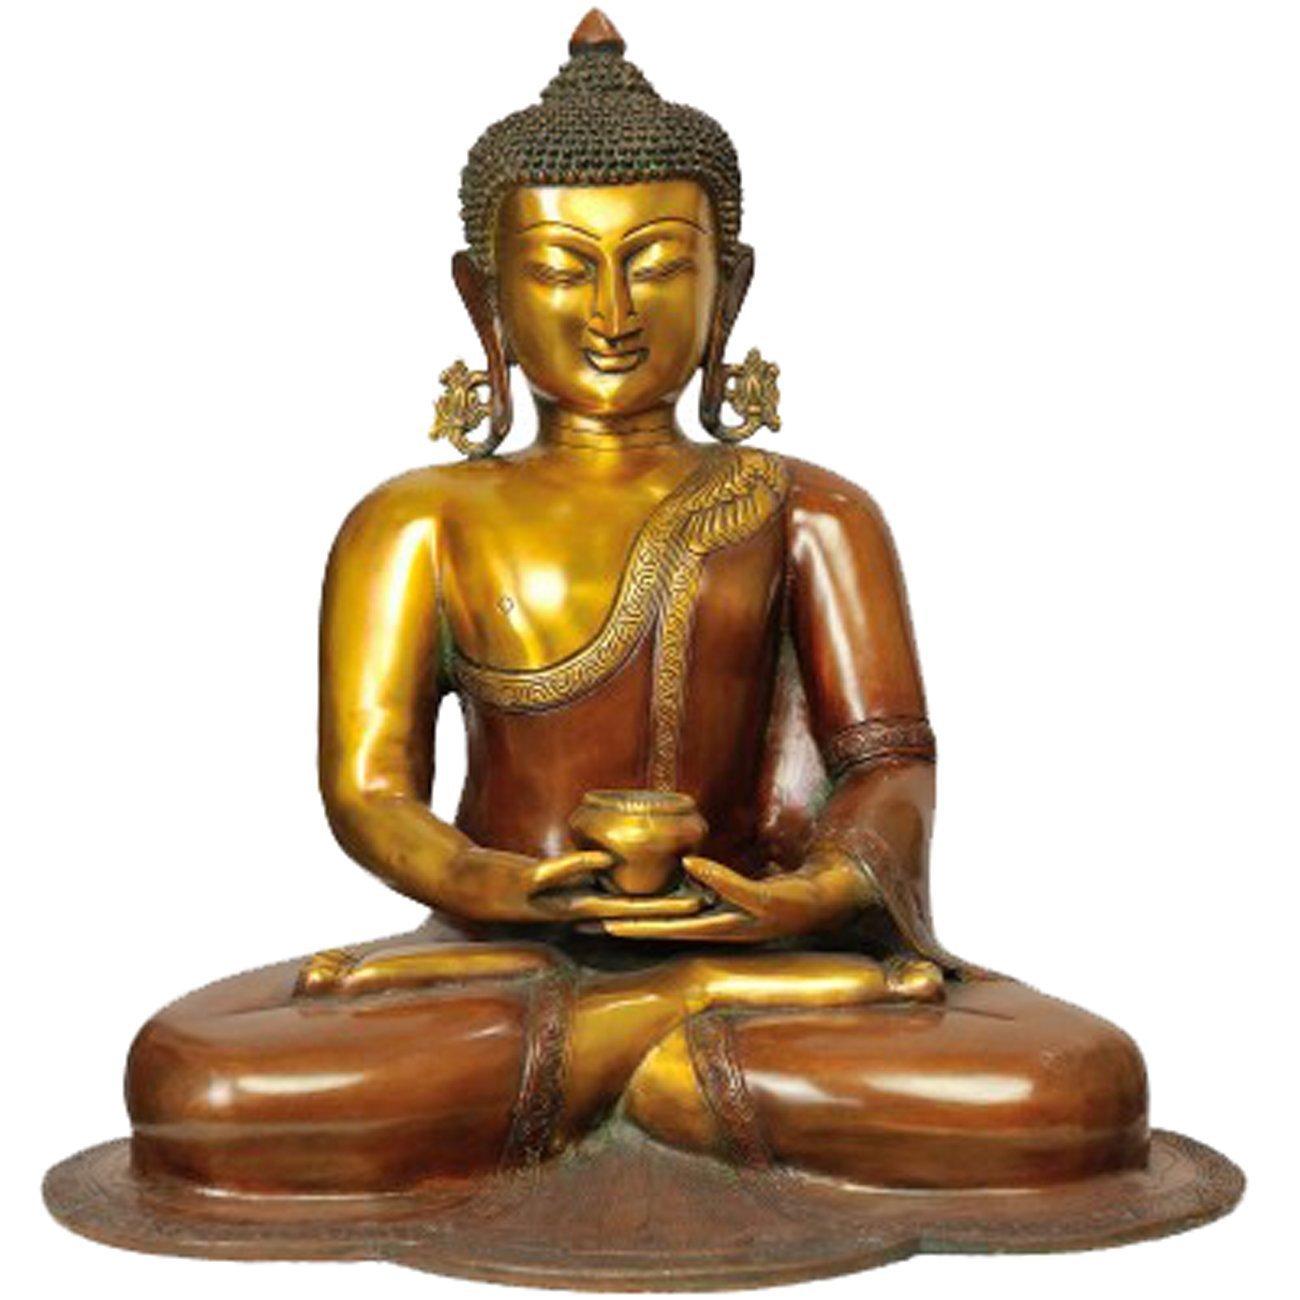 Idol Collections Vintage Meditating Buddha Brass Statue, Standard, Brown